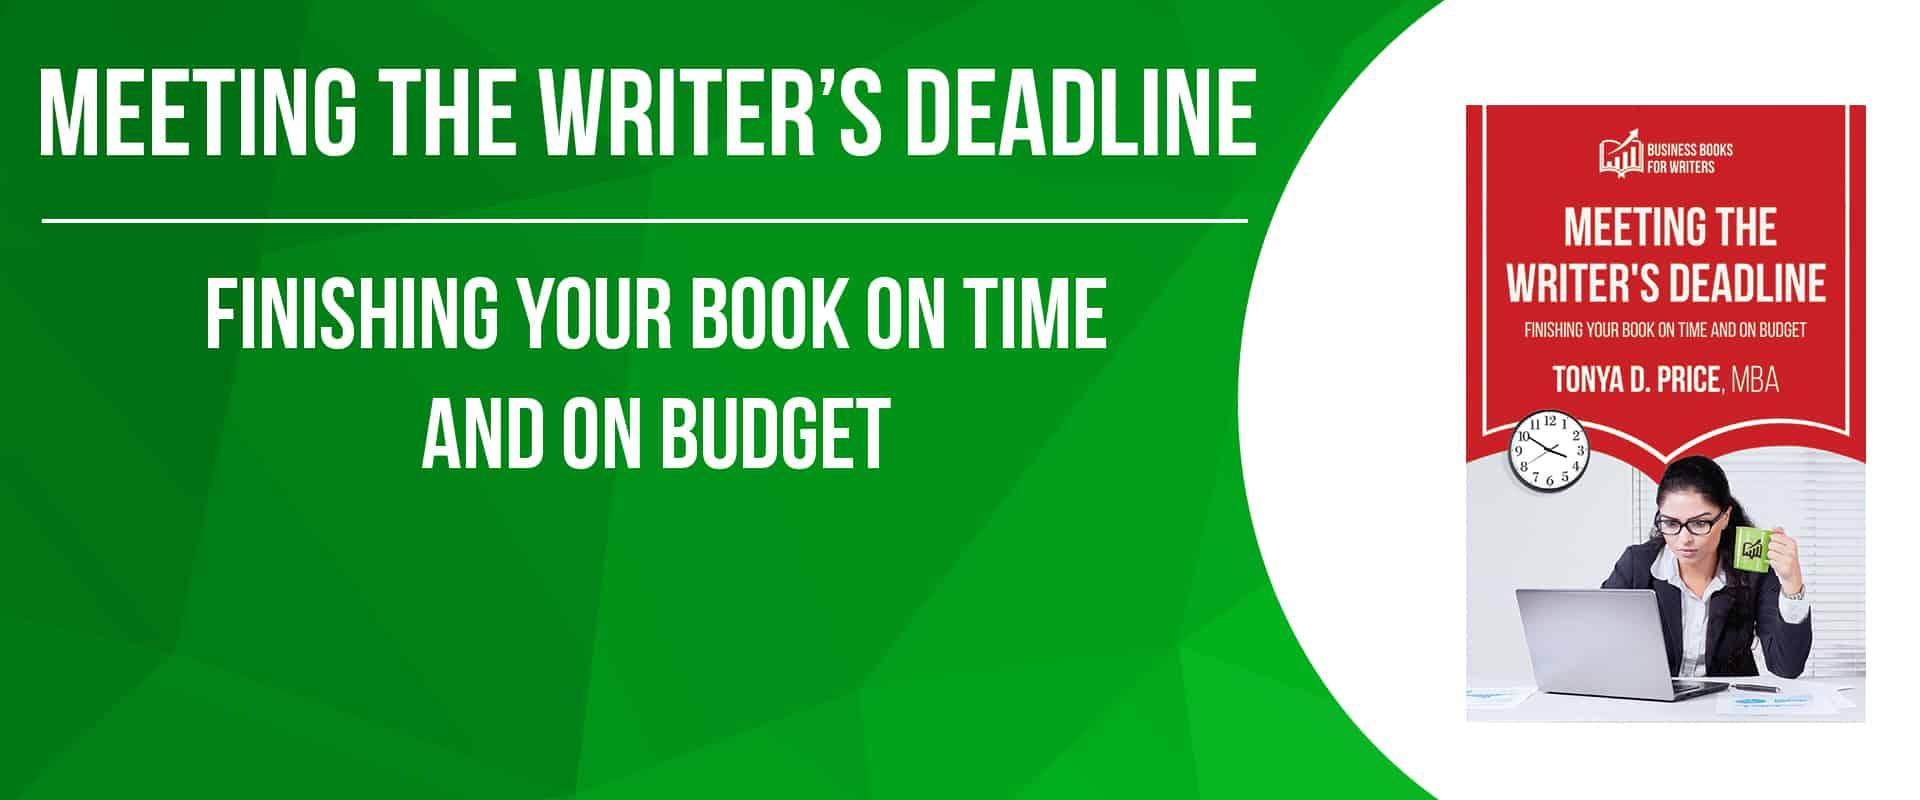 Meeting the Writer's Deadline